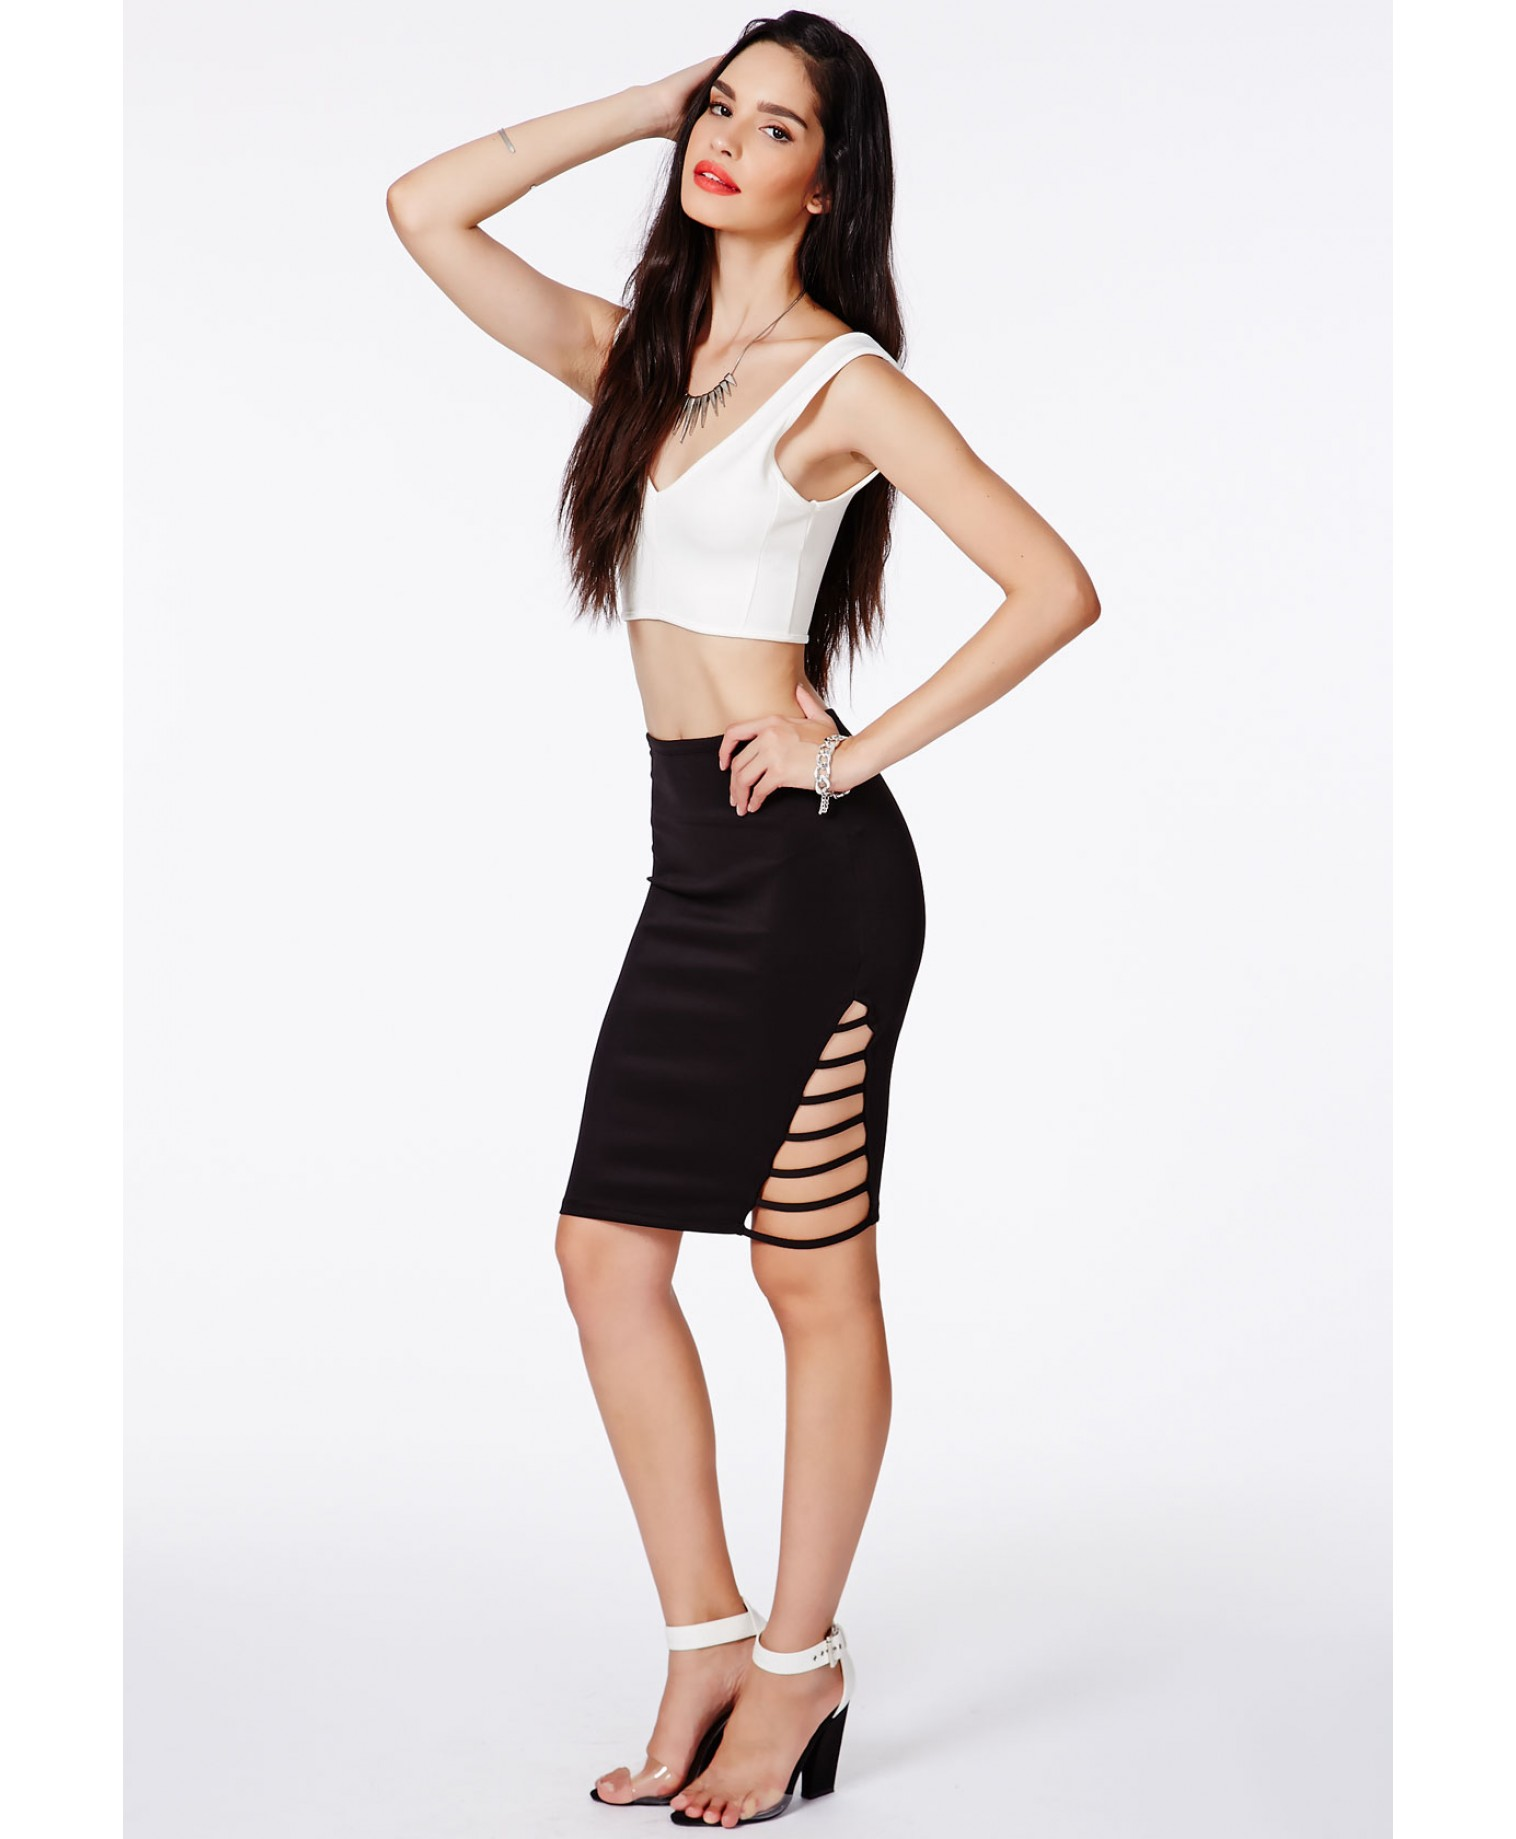 Ladies In Short Skirts - Dress Ala